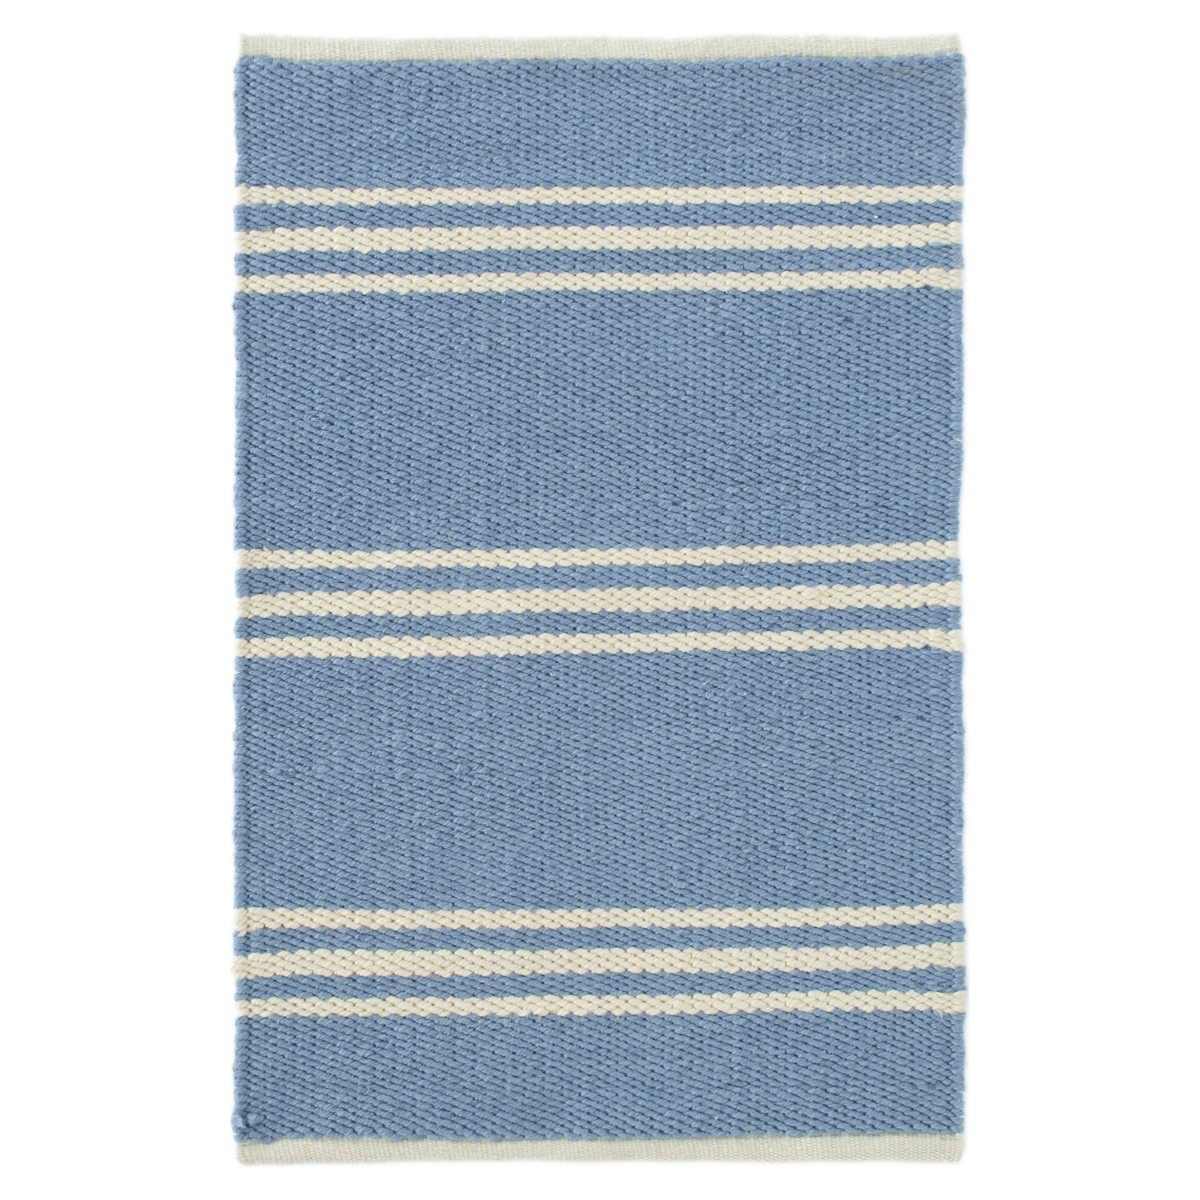 Lexington Indoor/Outdoor Rug - French Blue